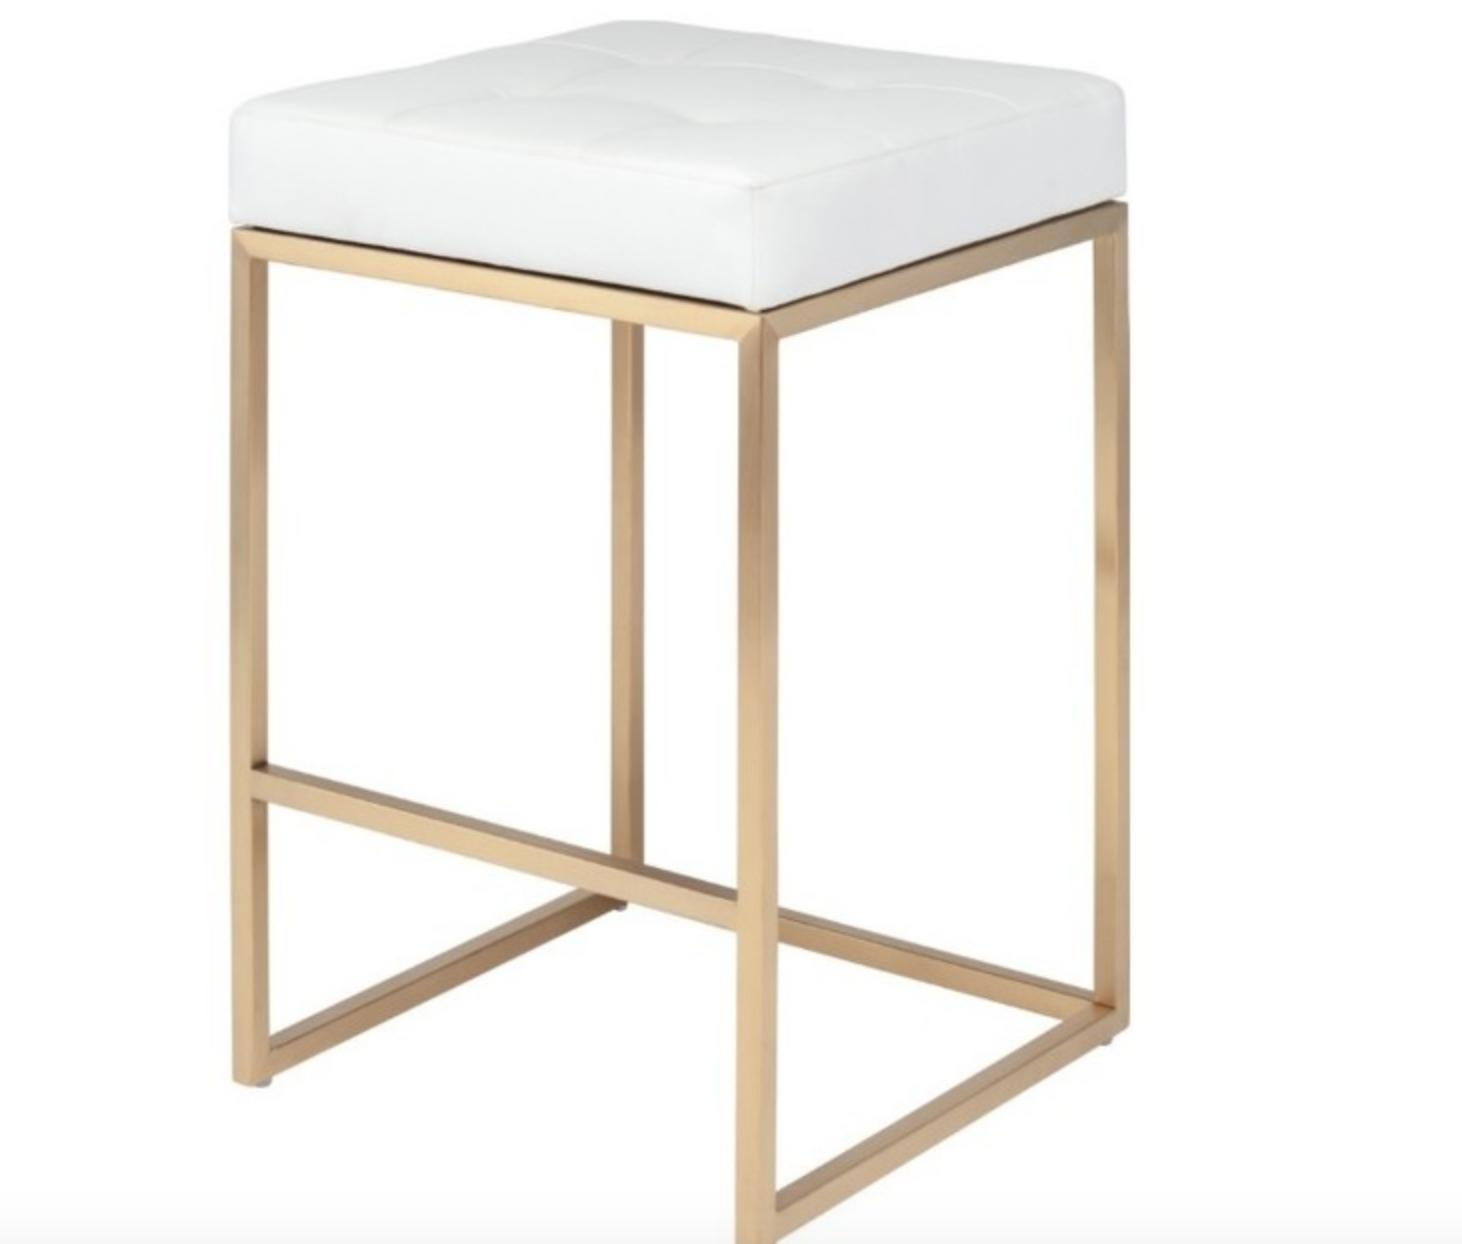 Home Bar Design Ideas Houzz: Chi Counter Height Bar Stool, Houzz $339